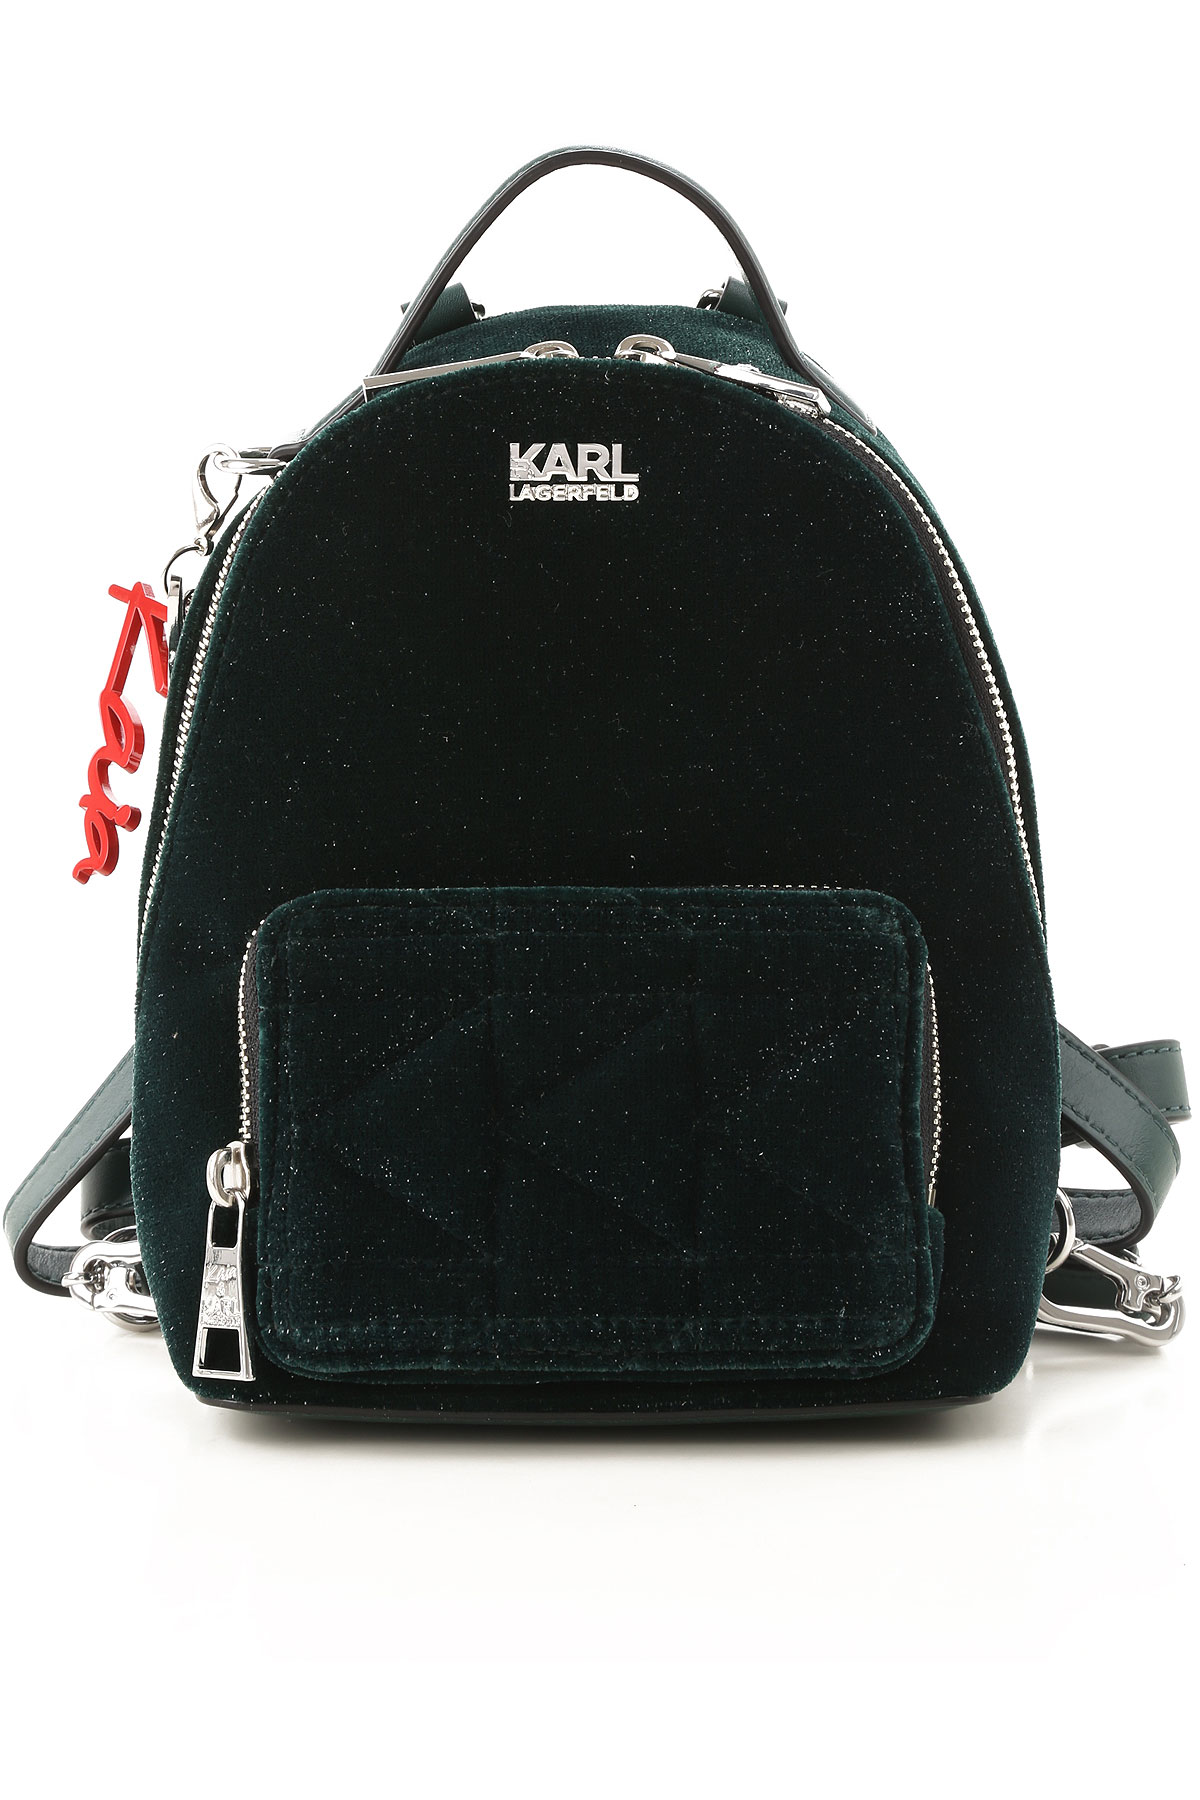 Karl Lagerfeld Backpack for Women On Sale, Bottle Green, Leather, 2019